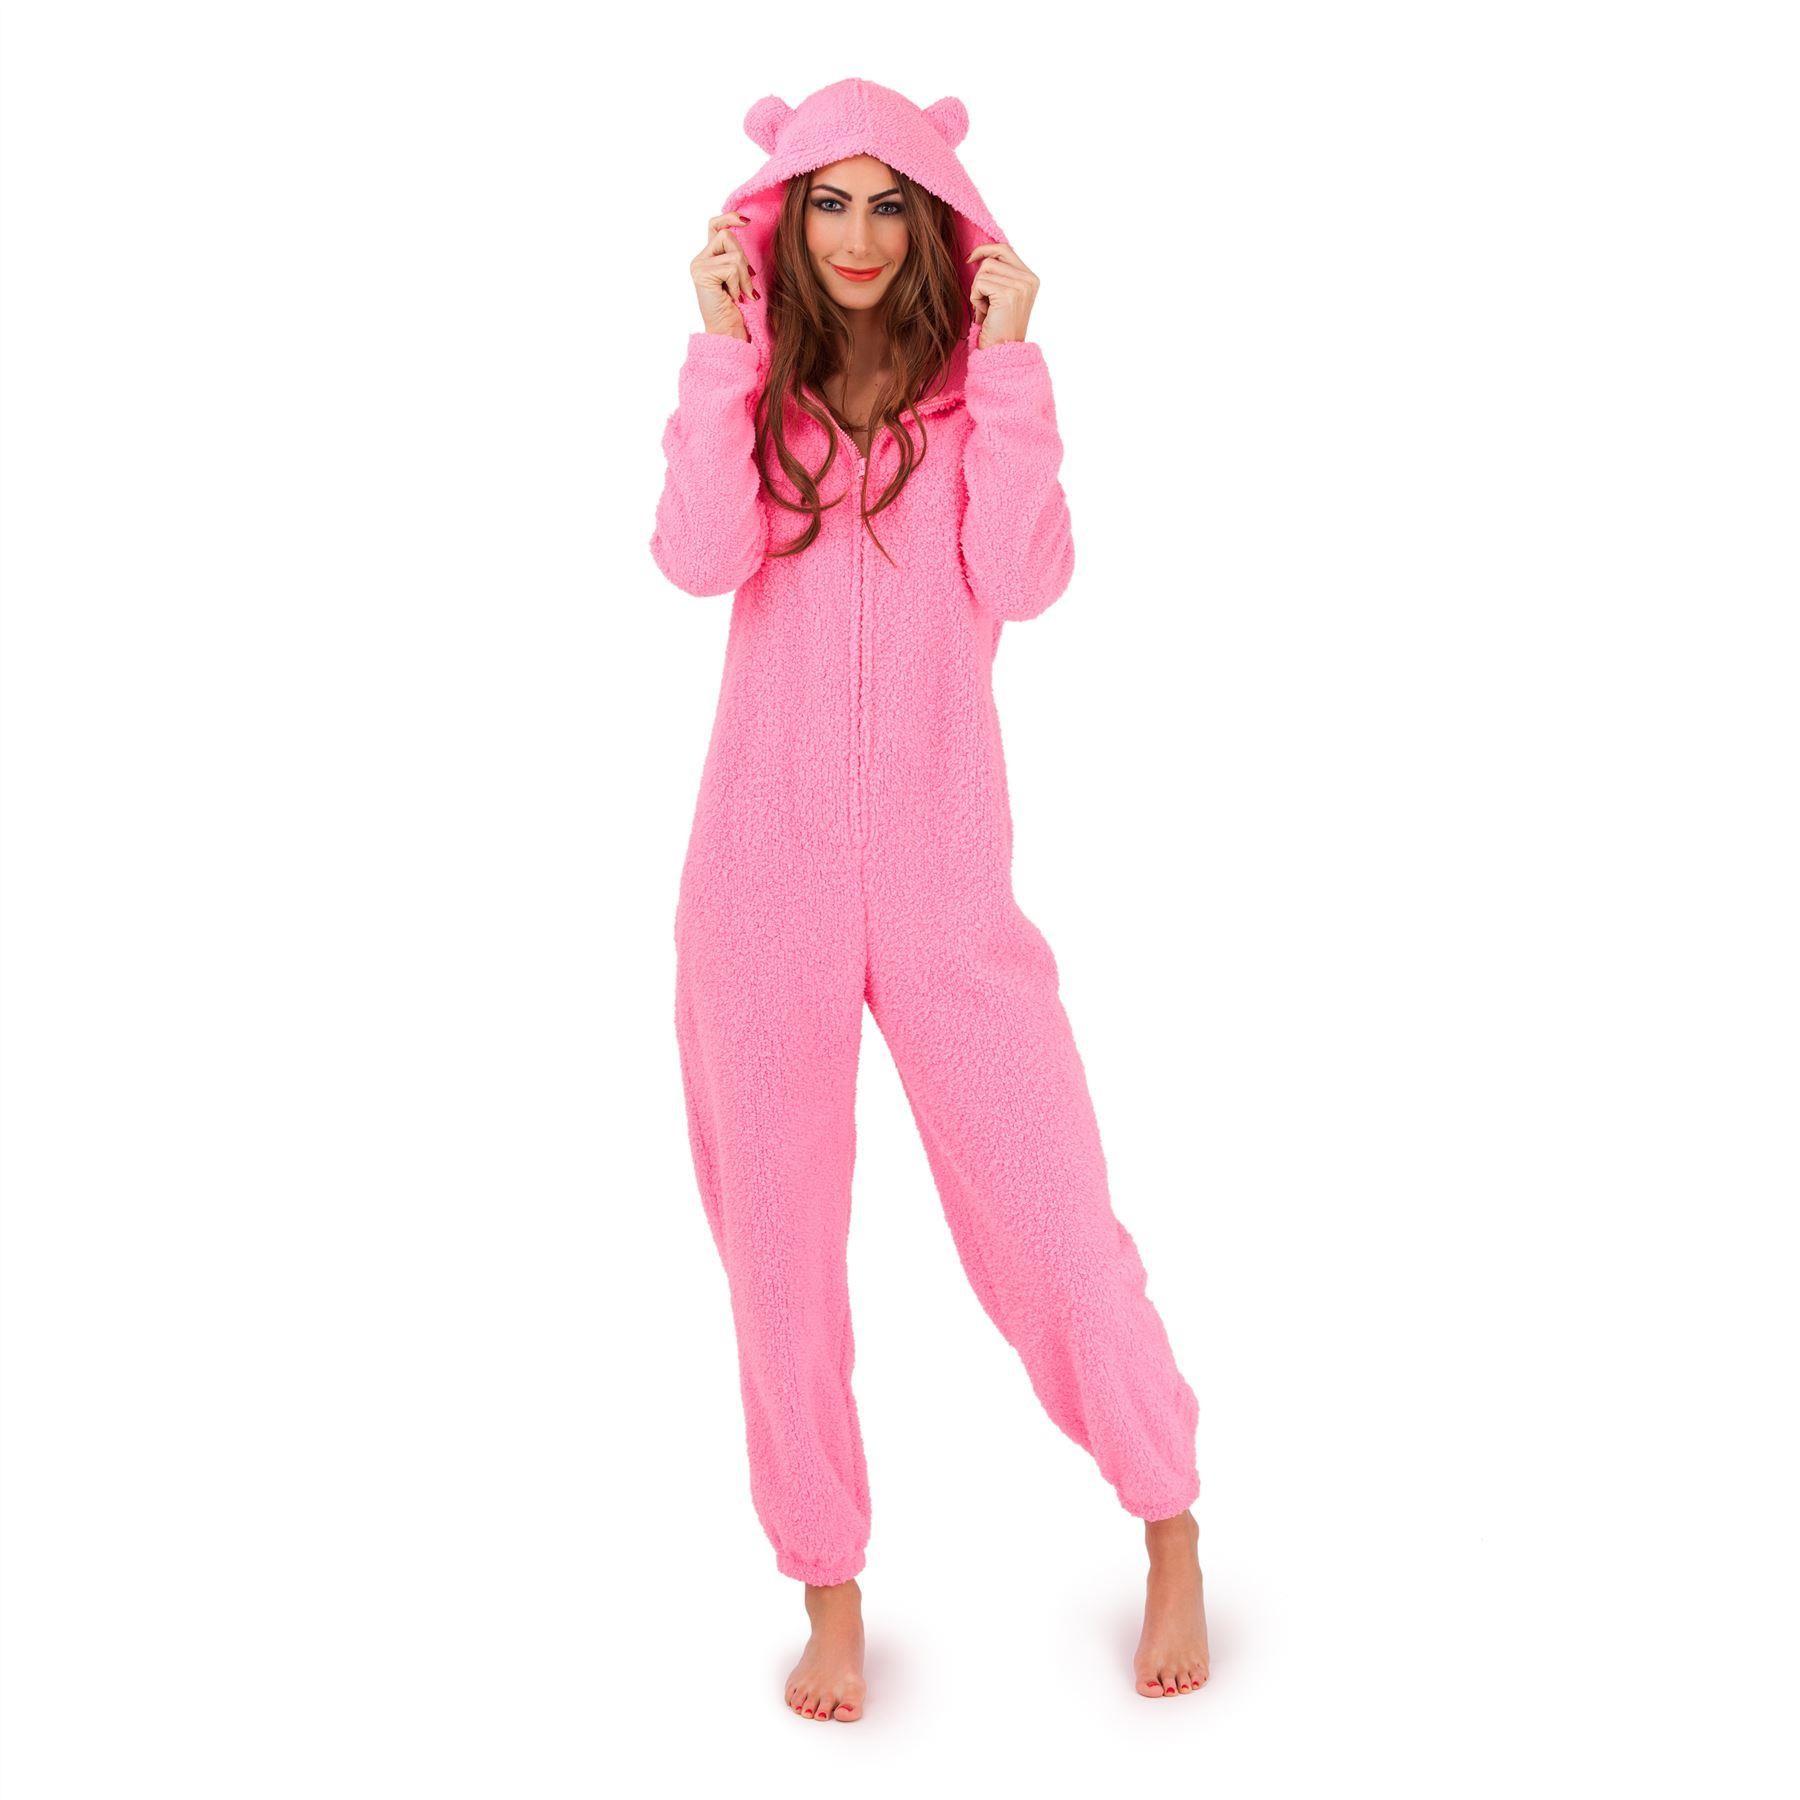 Loungeable Boutique Sherpa Fleece Onesie - Pink